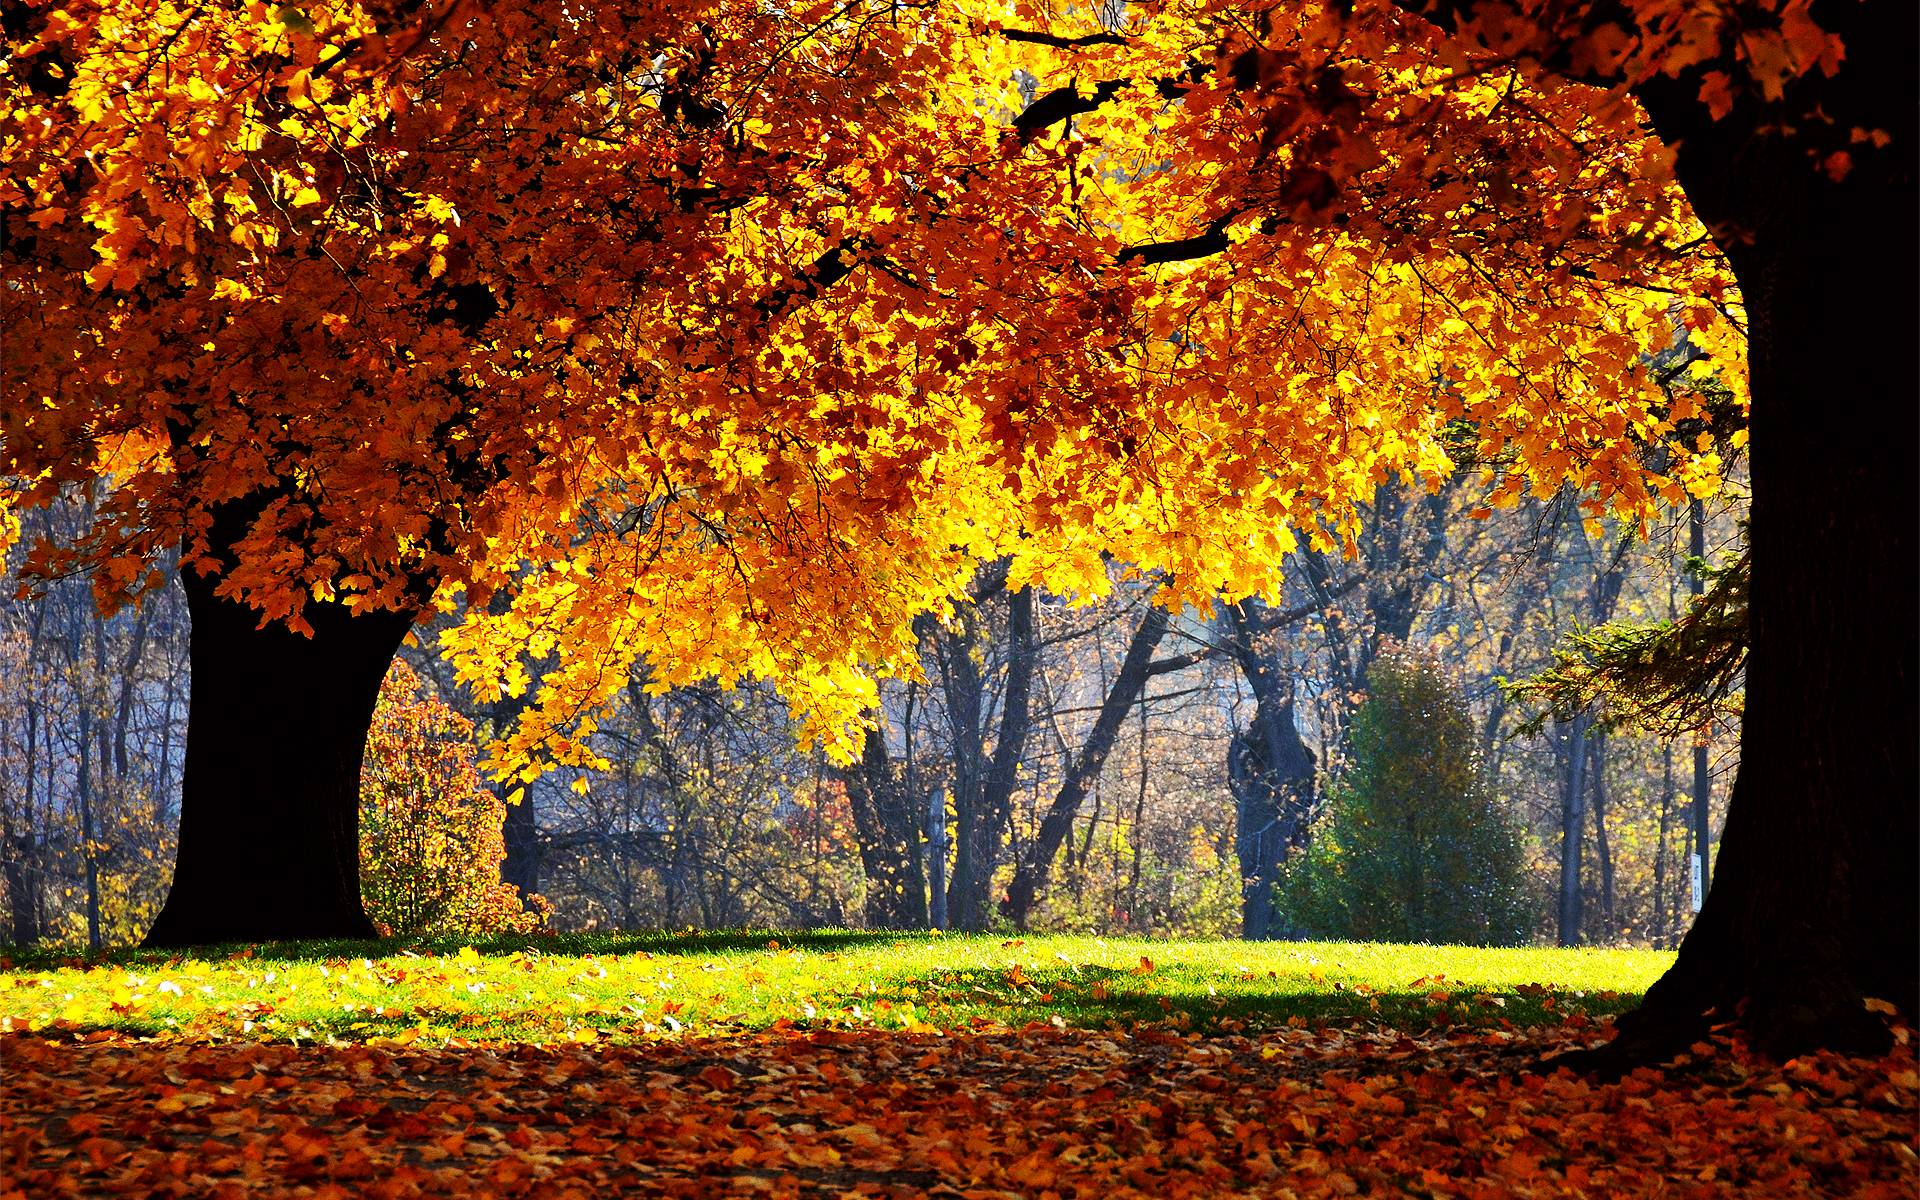 Fall Autumn Desktop Wallpapers Top Free Fall Autumn